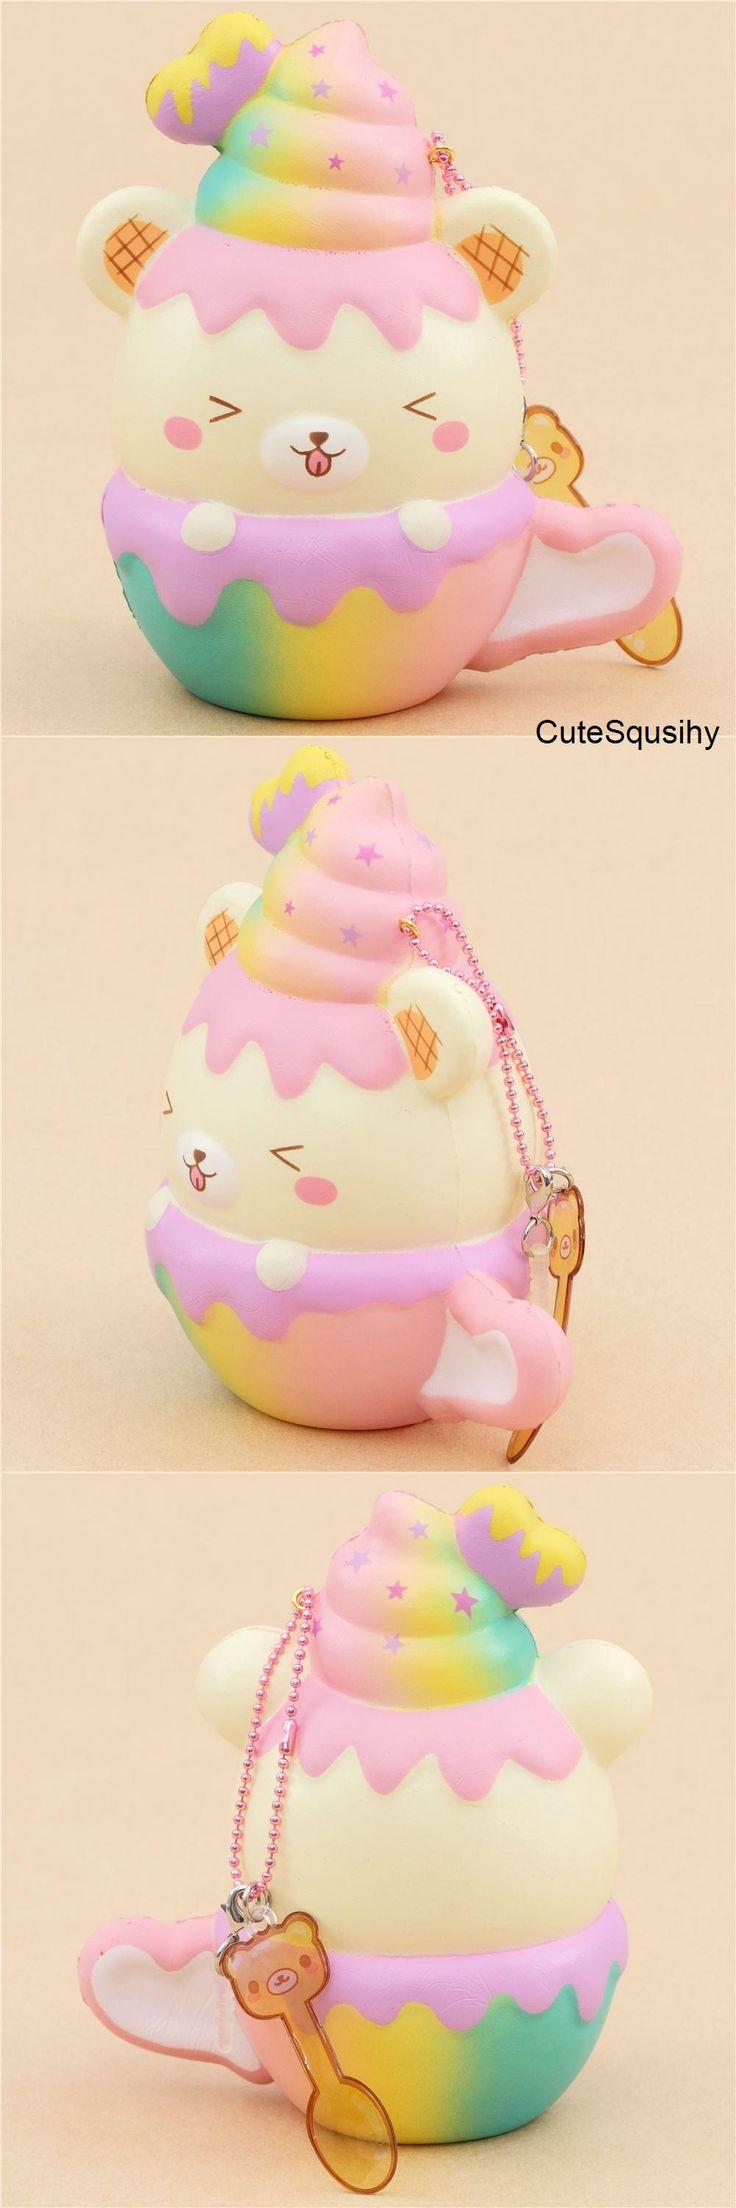 Kawaii Puni Maru Yumiibear rainbow mug squishy with dripping strawberry sauce!